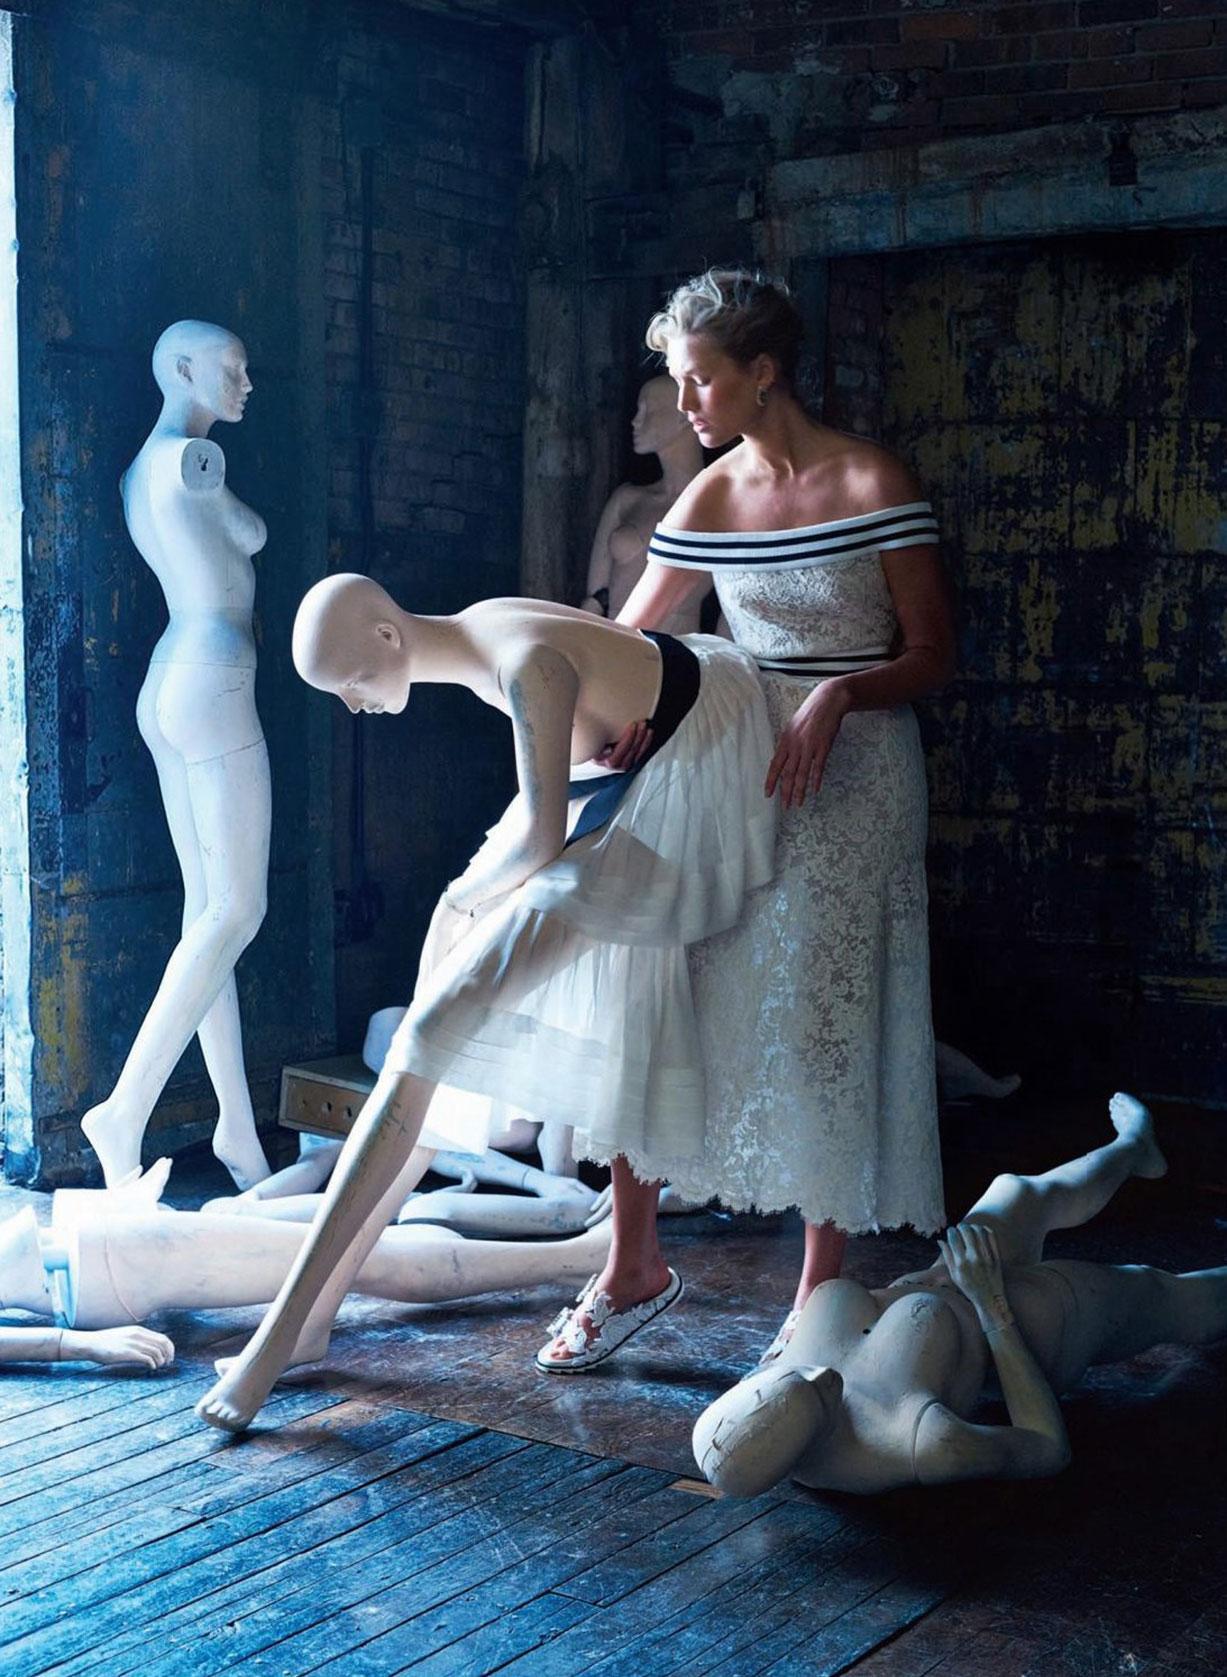 Кукольный домик с Тони Гаррн / Toni Garrn by Kristian Schuller - Bal Harbour spring 2017